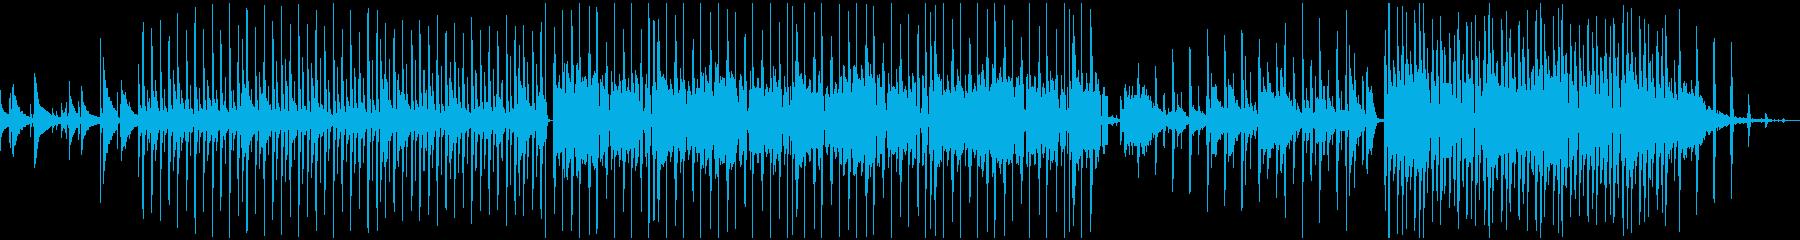 lofi hip hop トラックですの再生済みの波形